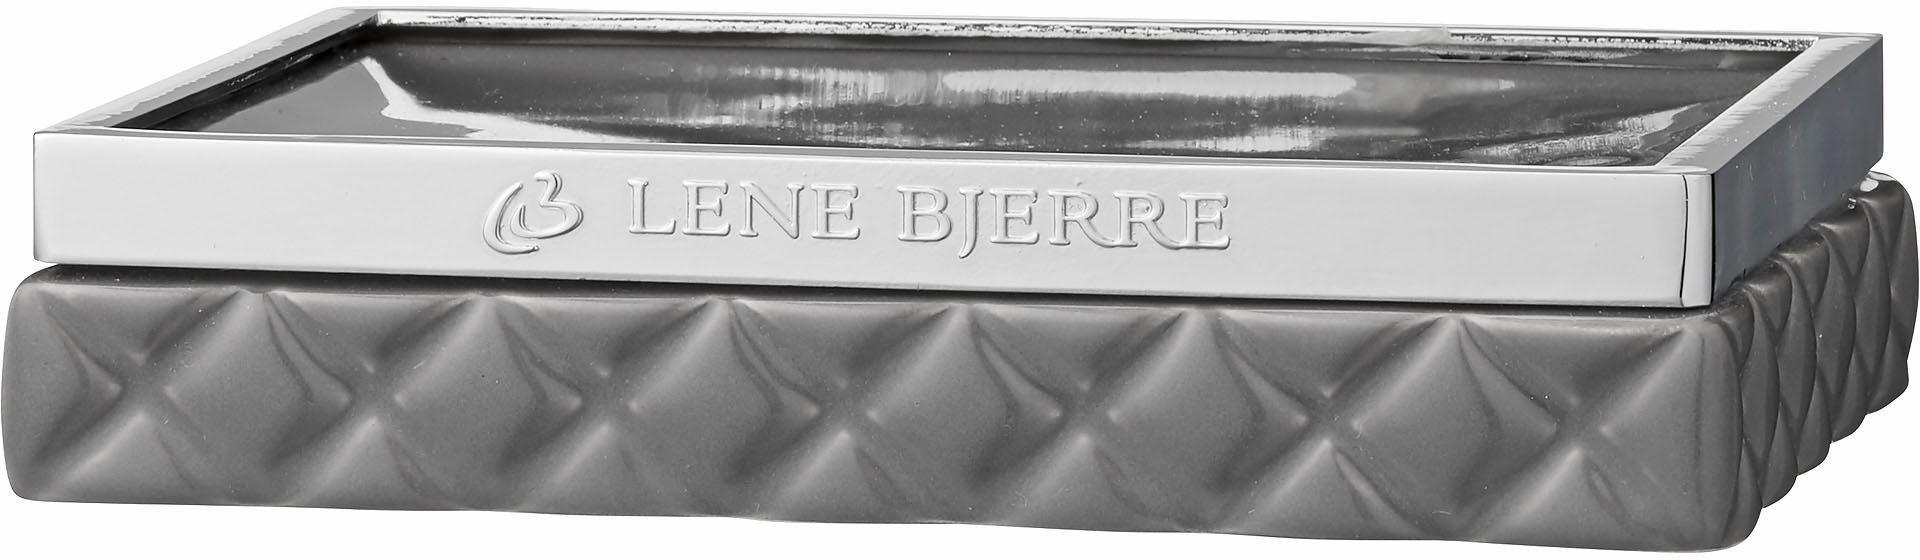 Lene Bjerre Seifenschale ´´Portia´´   Bad > Bad-Accessoires > Sonstige Badaccessoires   Keramik   Lene Bjerre